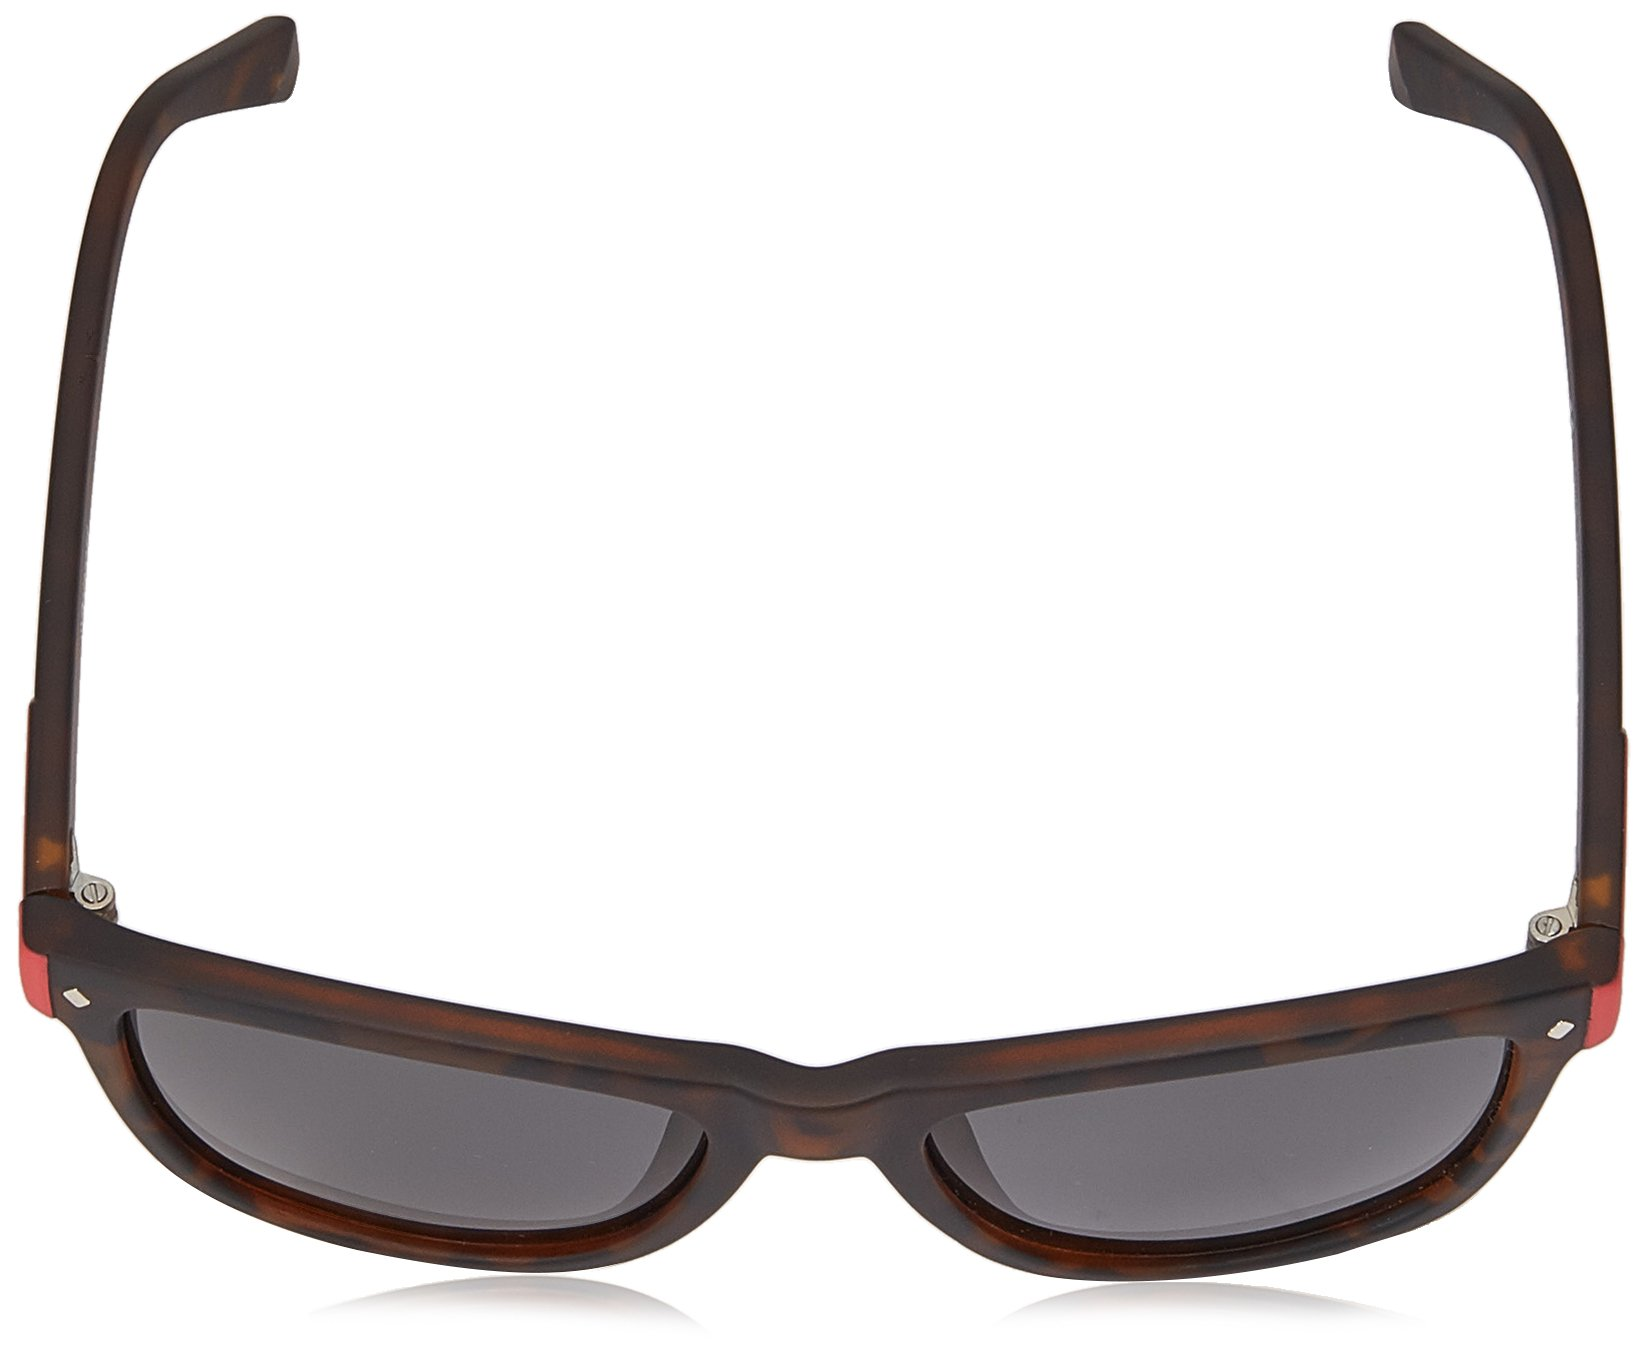 Polaroid Sunglasses Girls' Pld8025s Polarized Rectangular Sunglasses, MATT HVNA, 48 mm by Polaroid Sunglasses (Image #4)